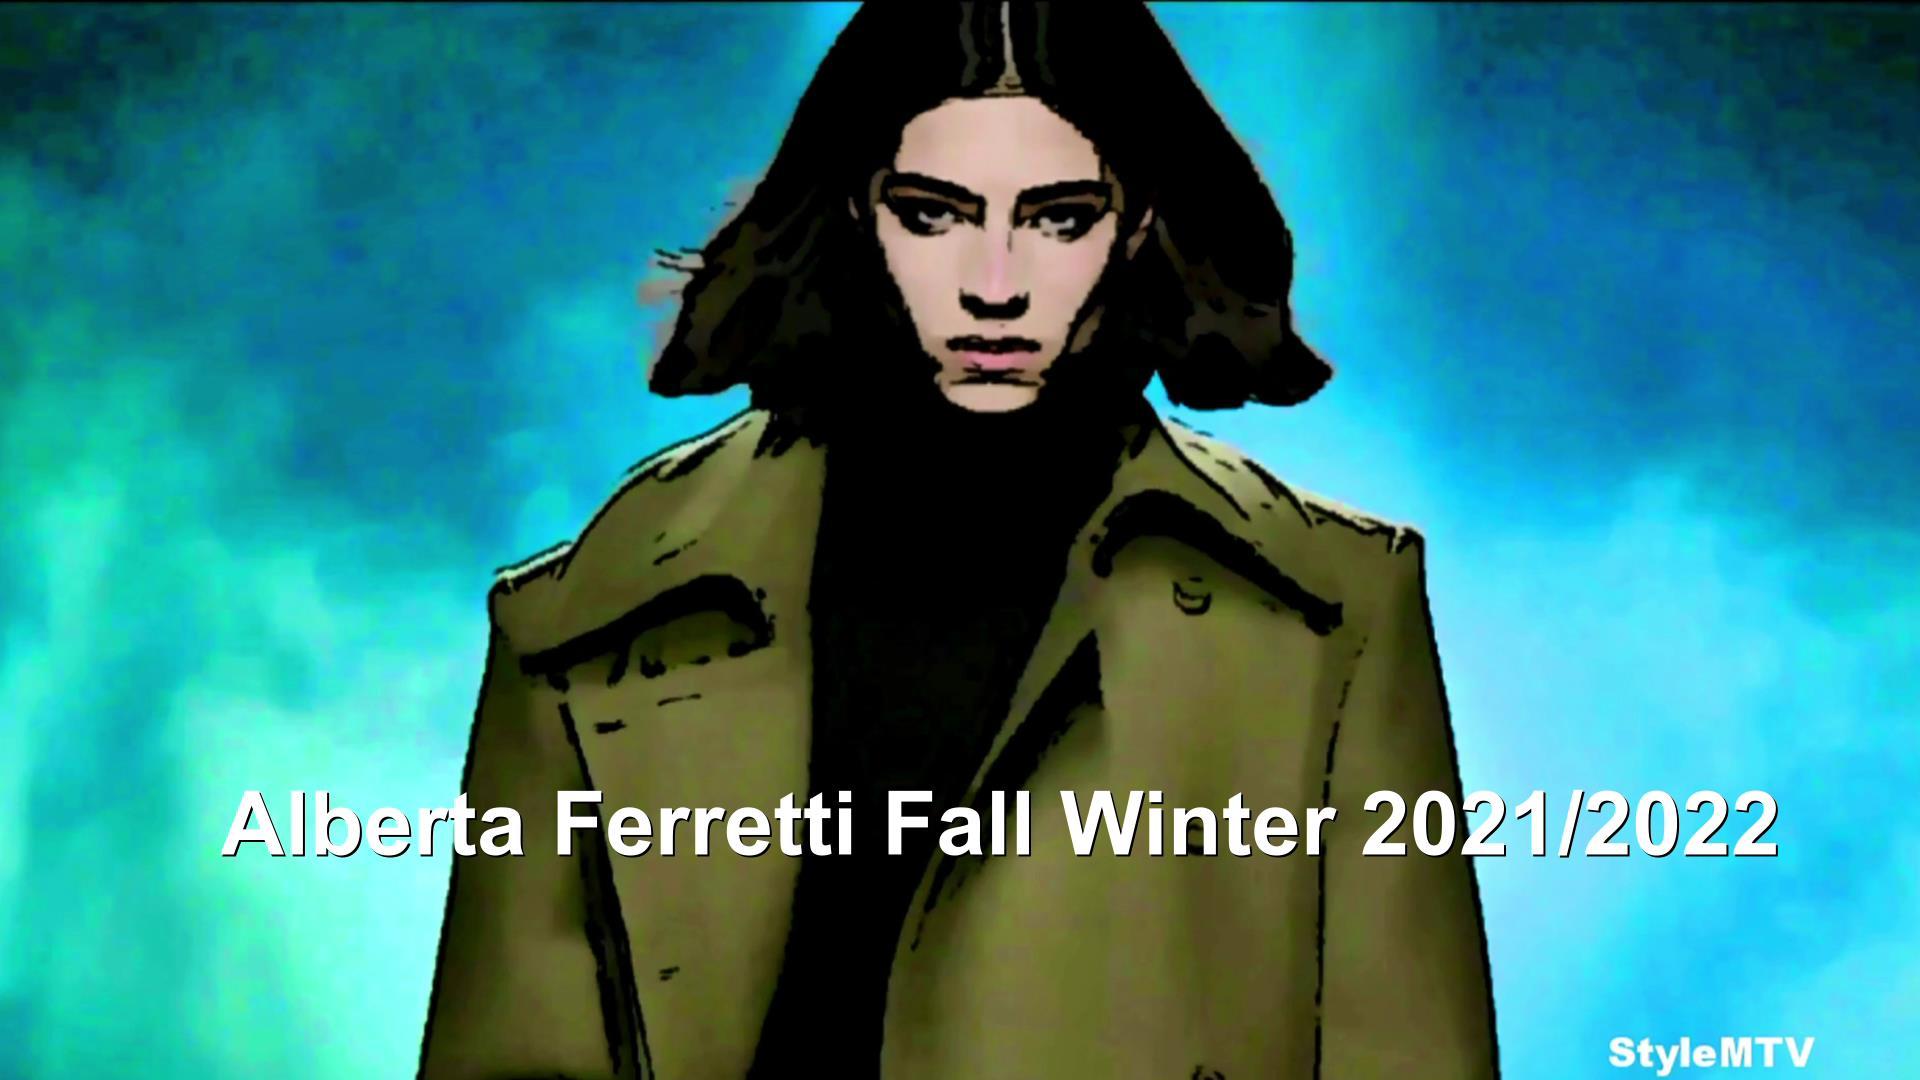 Alberta Ferretti FW21 Art Milan, Italy